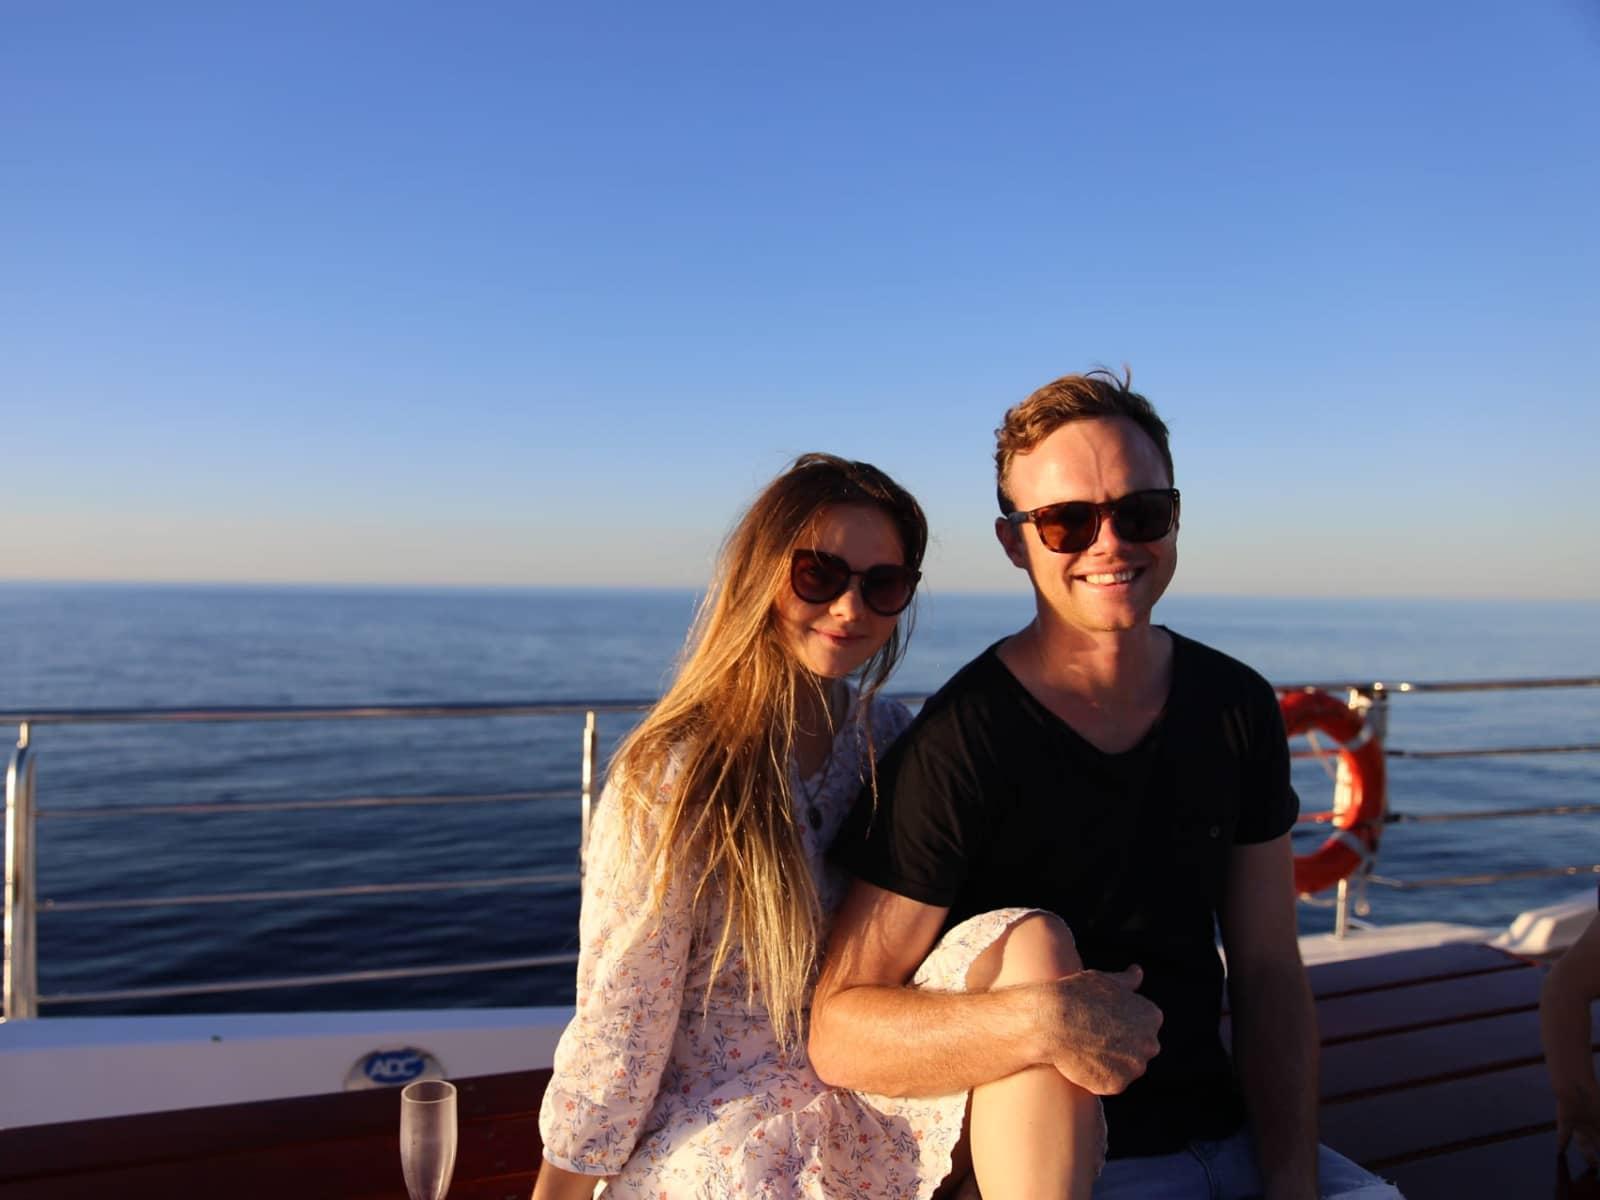 Jordan & Mattea from Perth, Western Australia, Australia